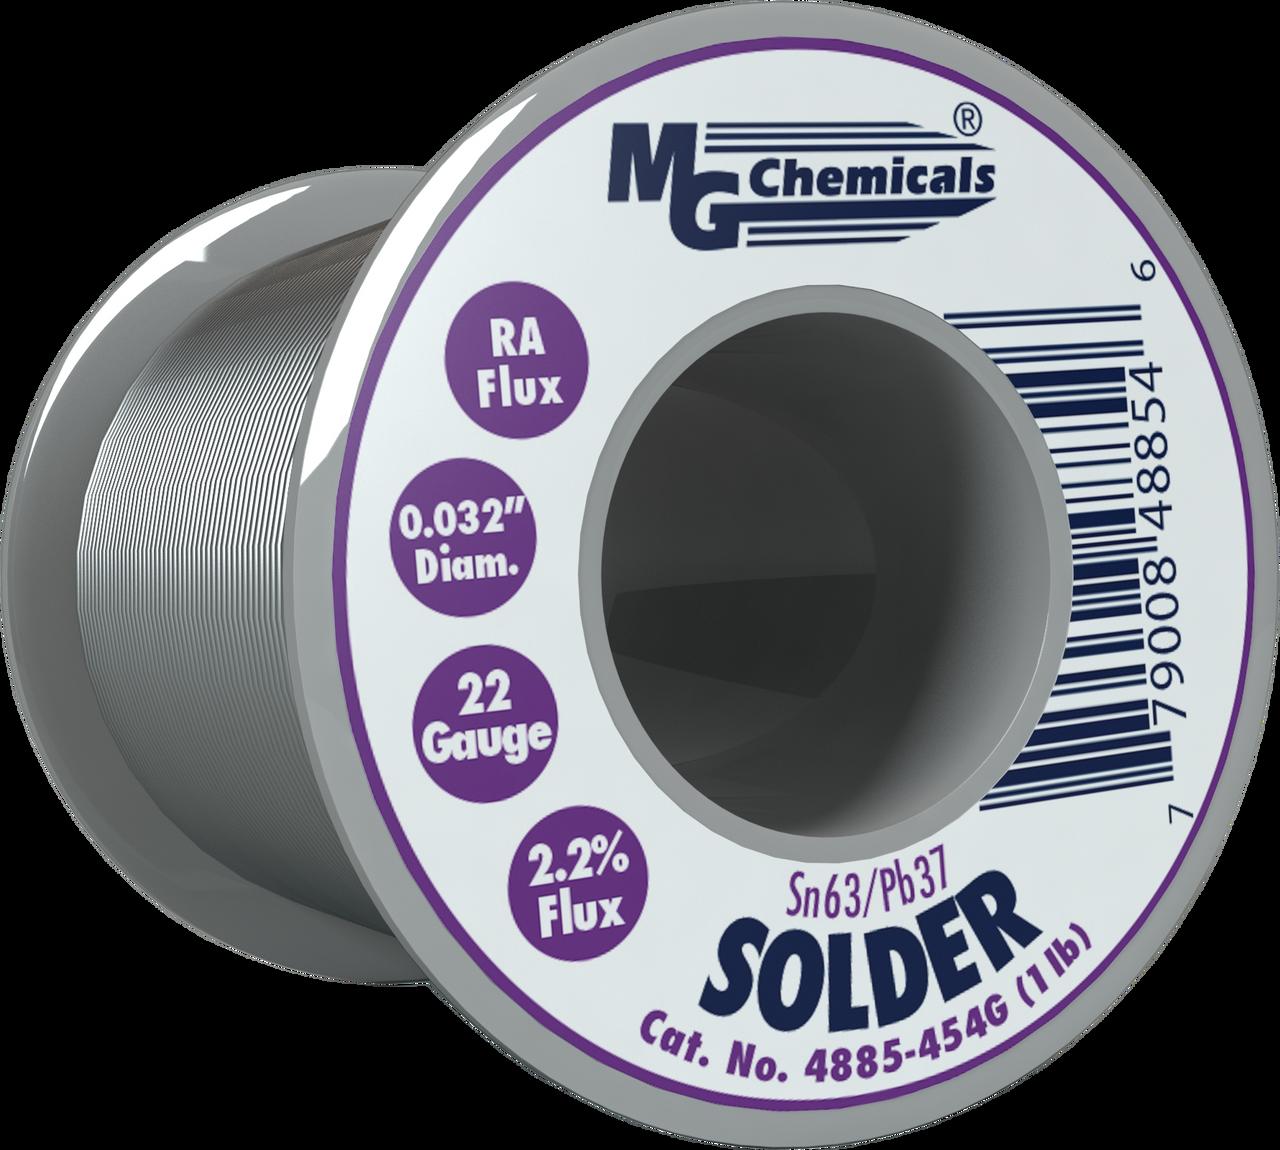 "MG Chemicals - Solder (Sn63/Pb37 1.0lbs 0.032"")"